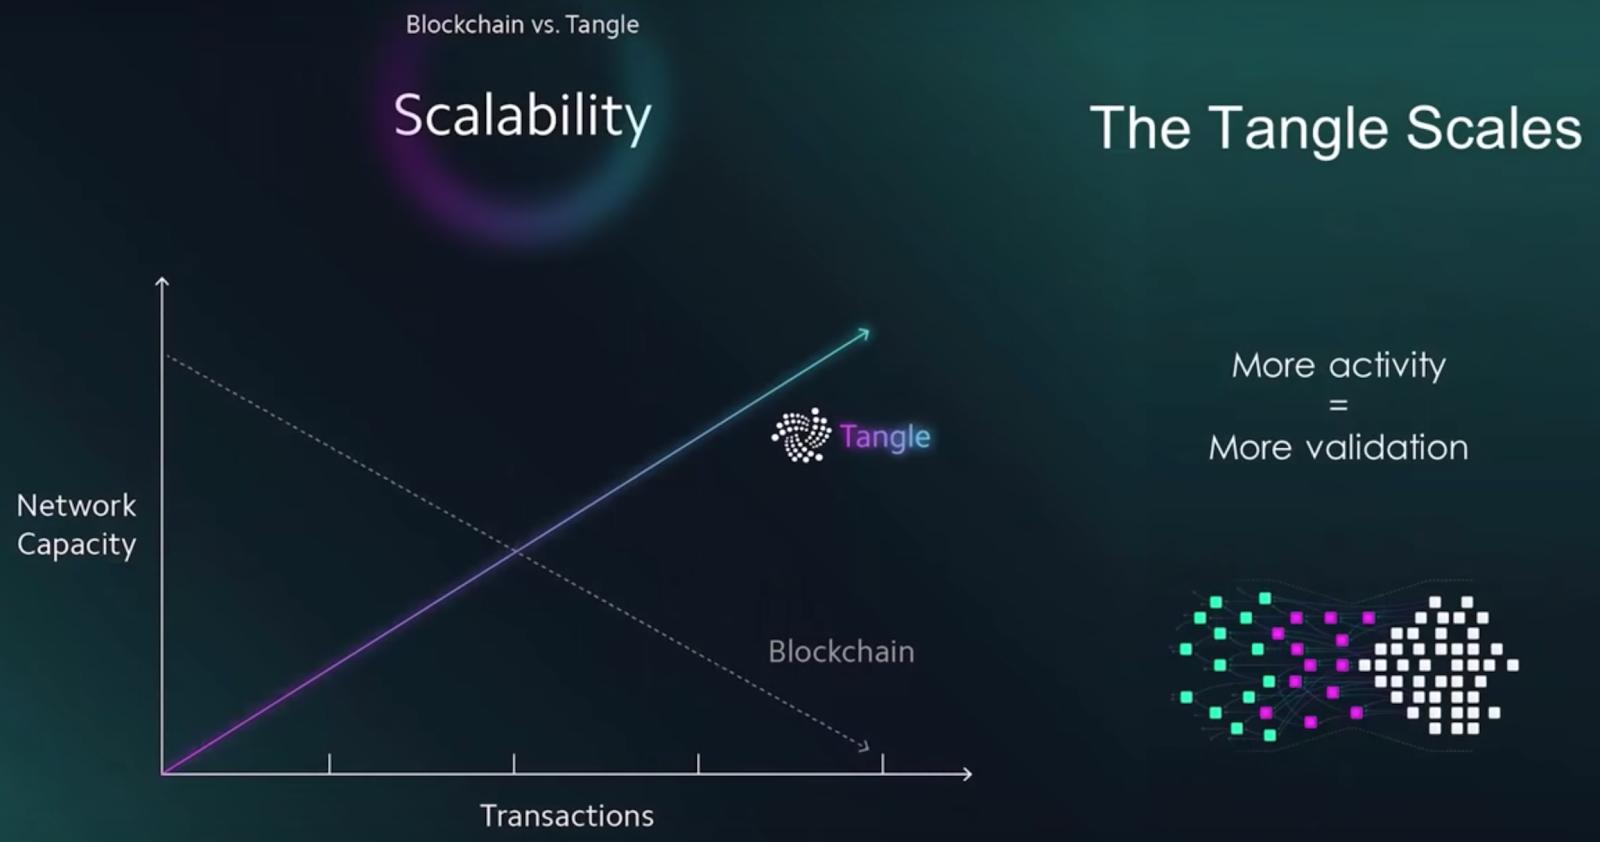 Blockchain versus Tangle